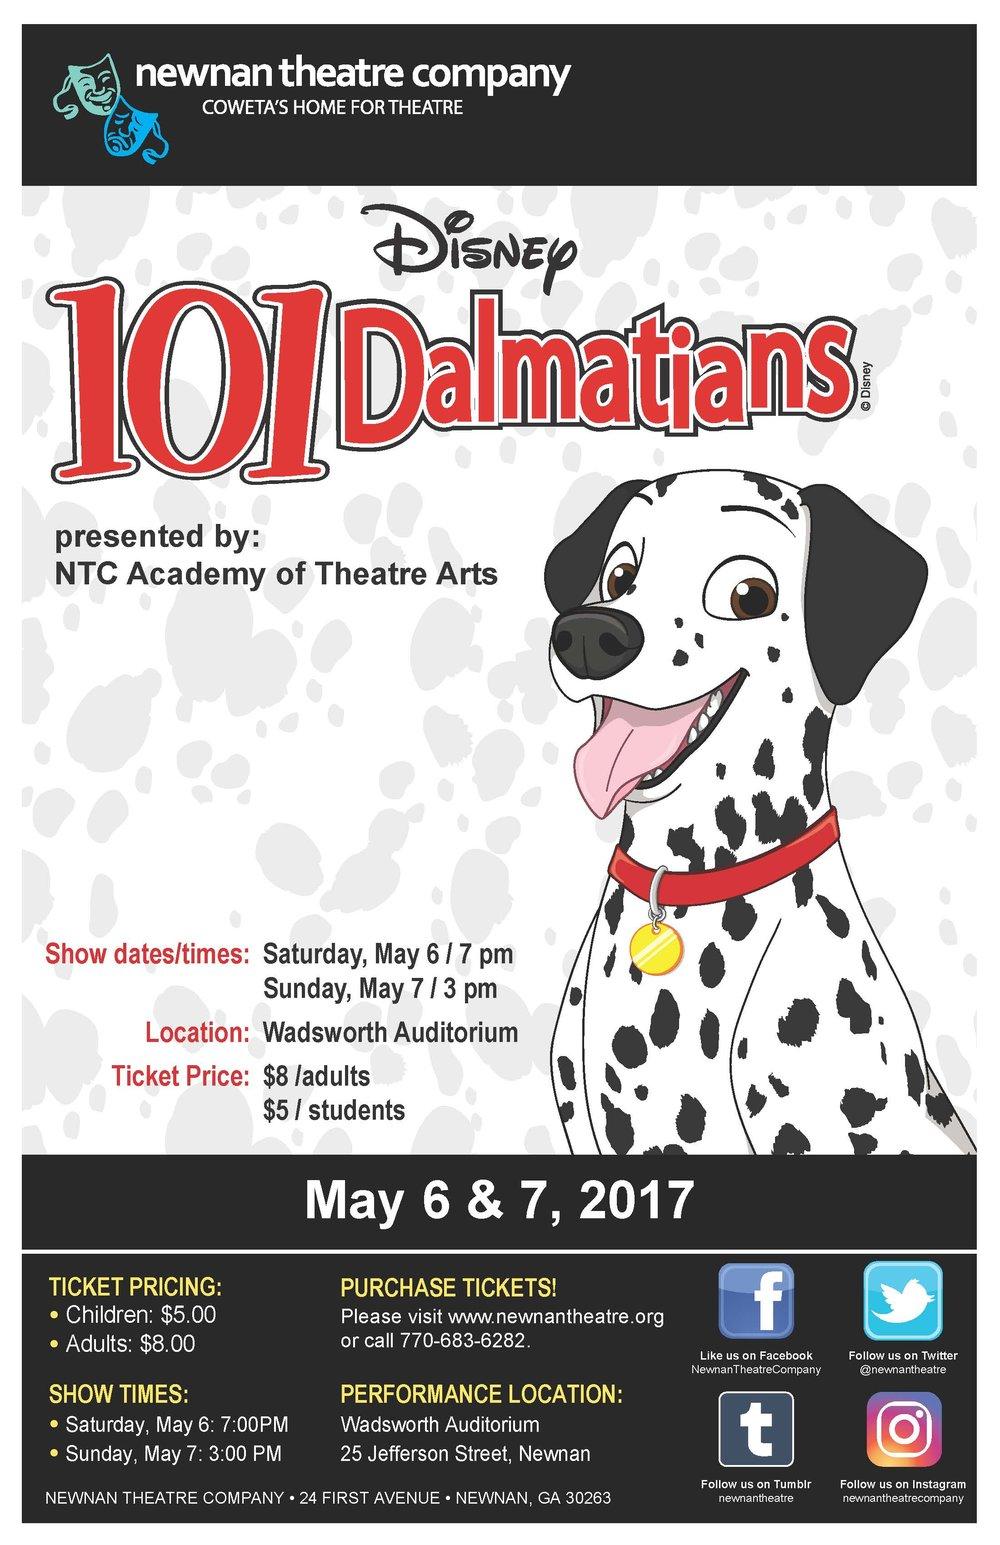 101 Dalmation poster 11x17.jpg